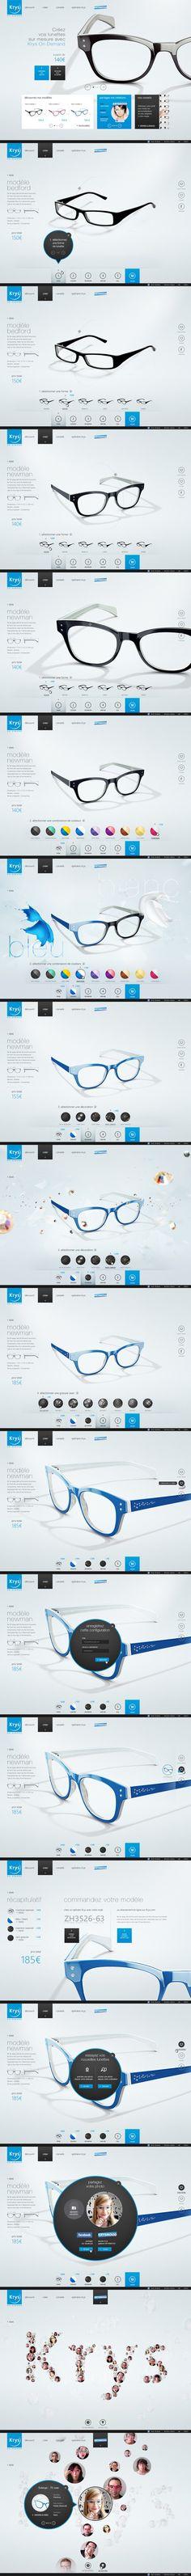 UX/UI Design / Krys Configurator by Yul http://ecommerce.jrstudioweb.com/